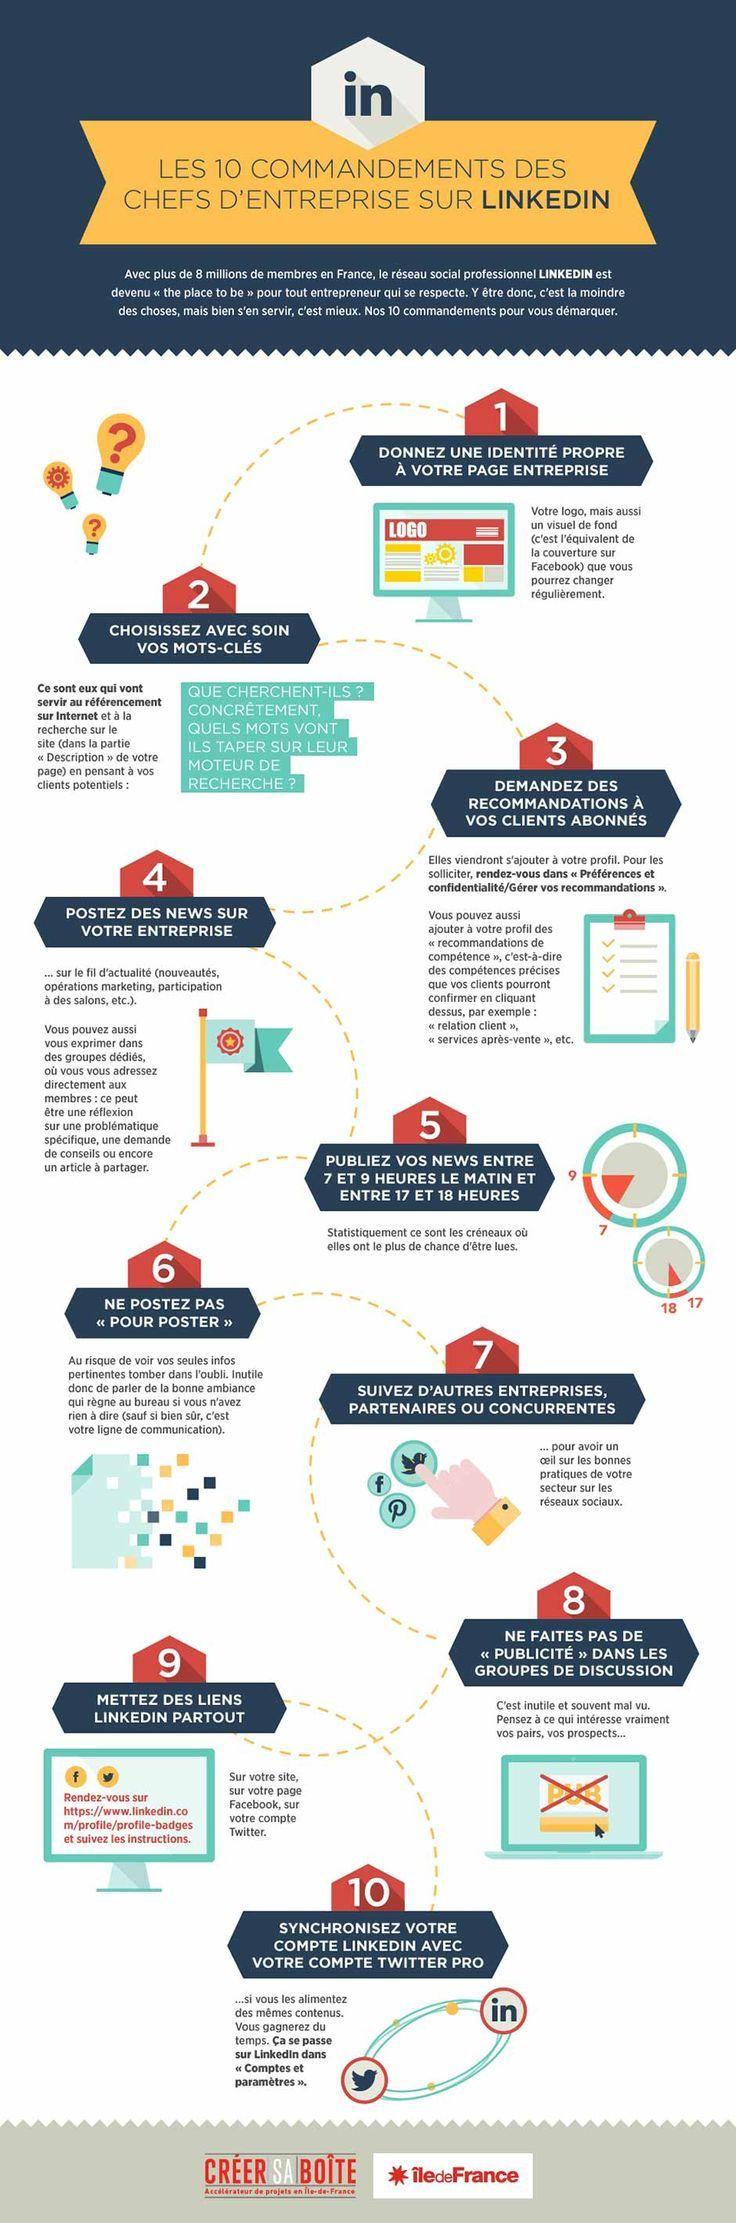 Social Media Infographic Les 10 Commandements A Suivre Sur Linkedin Region Ile De France Infographicnow Com Your Number One Source For Daily Infographic Social Selling Linkedin Infographic Marketing Web Marketing